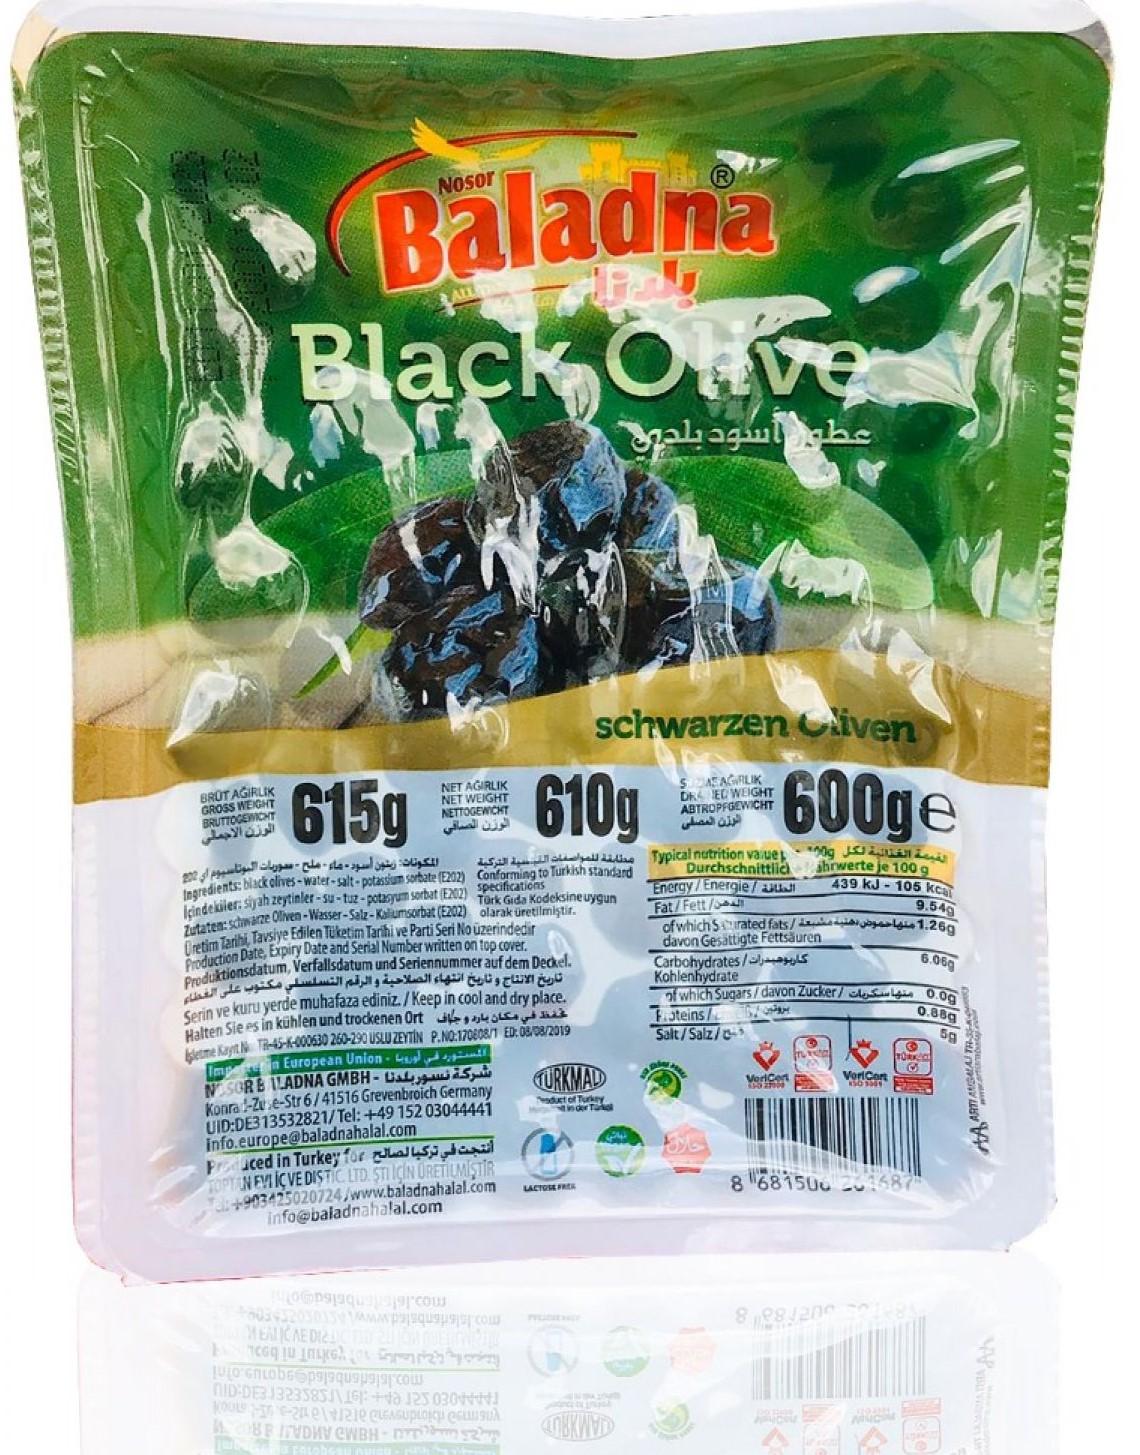 Baladna schwarze Oliven 600g  زيتون اسود عطون  بلدنا